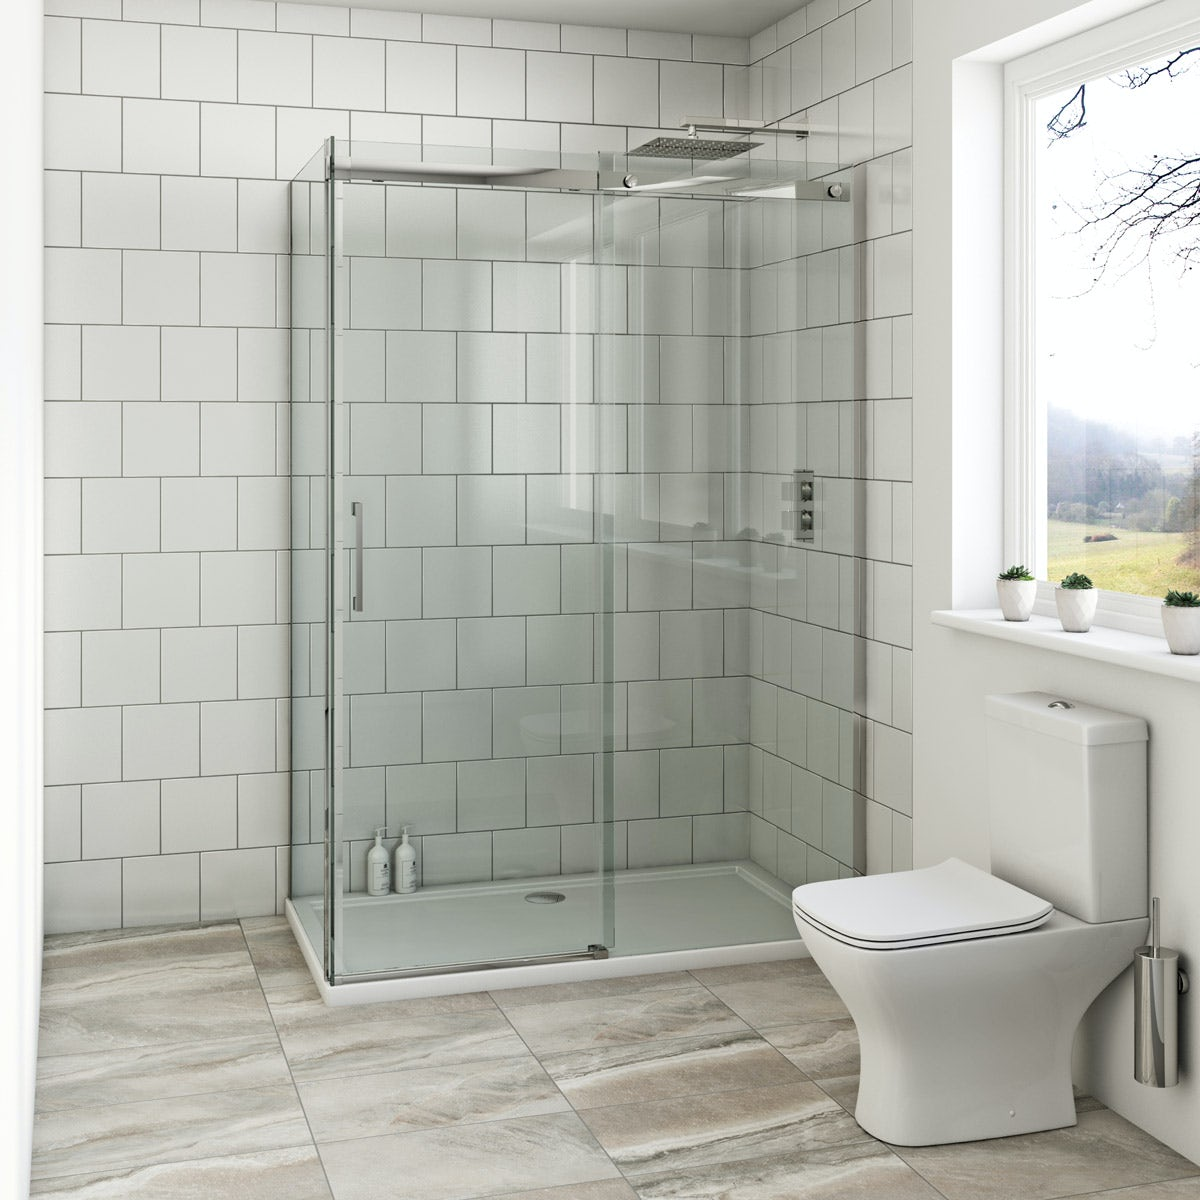 Mode Harrison 8mm easy clean rectangular shower enclosure 1200 x 800